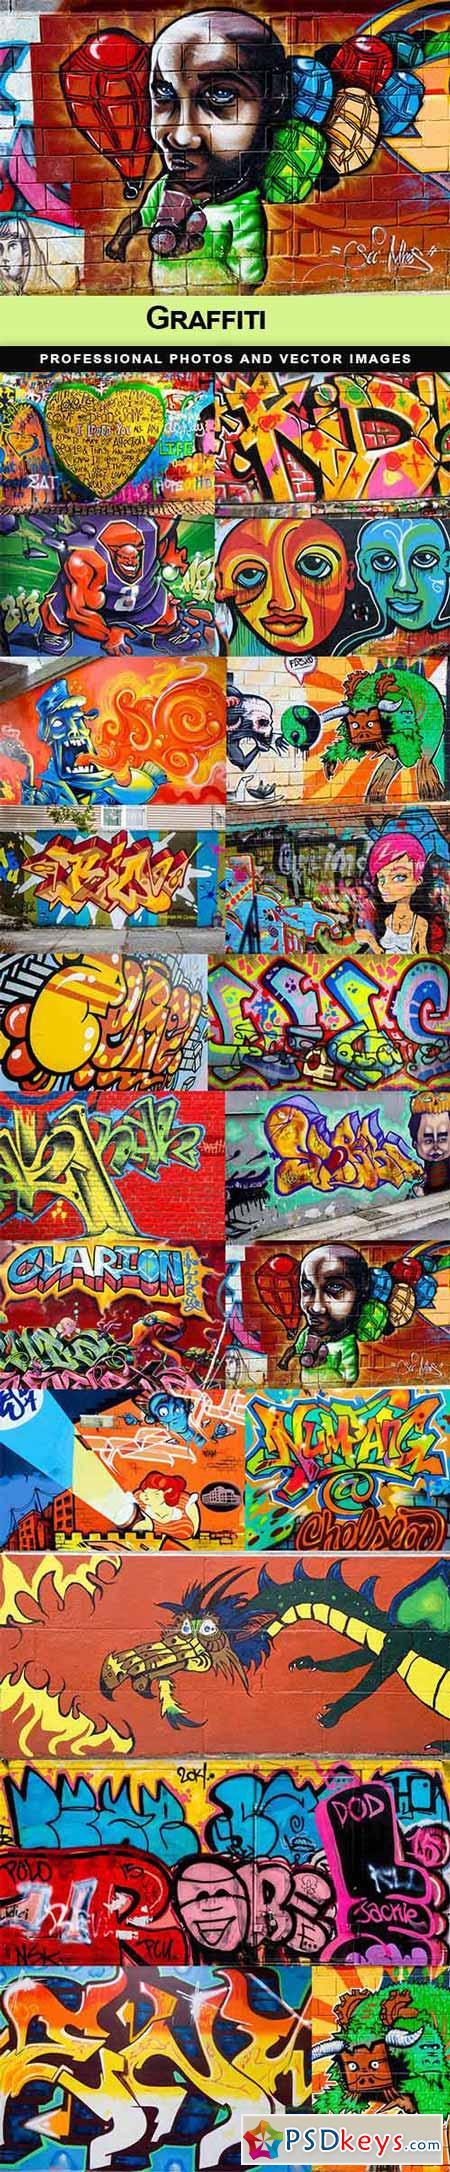 Graffiti - 20 UHQ JPEG